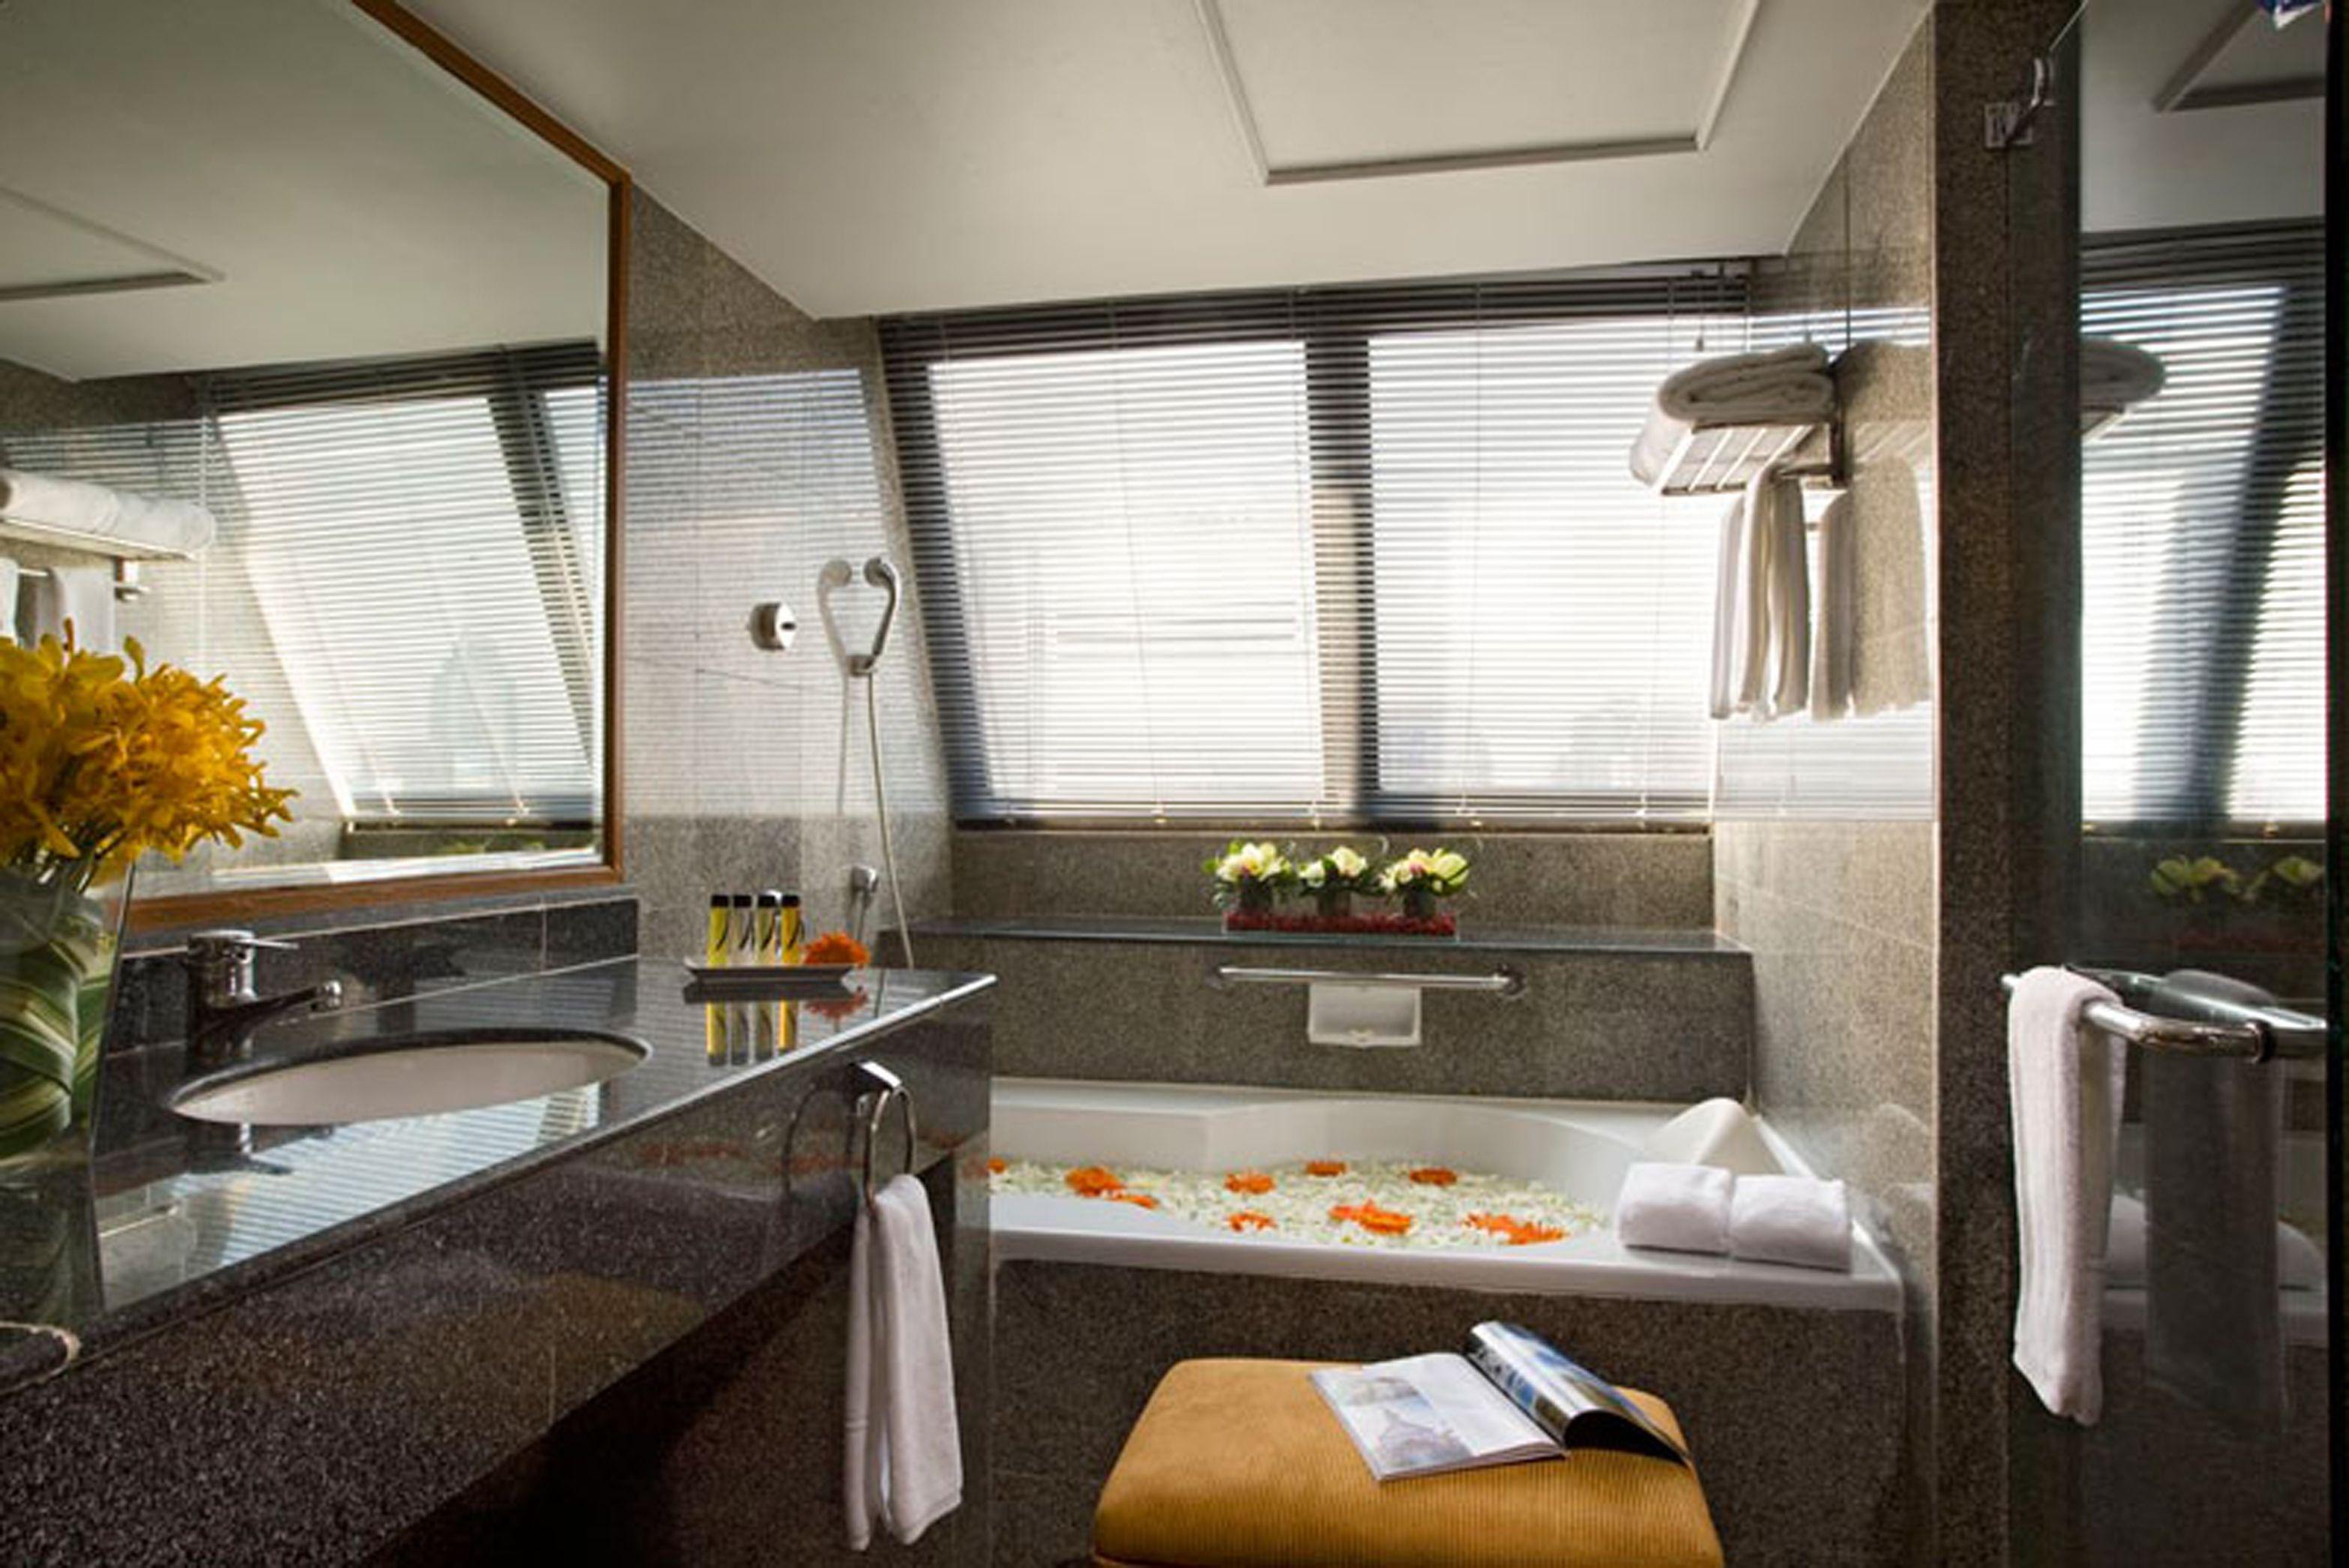 Designing Small Bathroom Ideas Spa Bathroom Design Ideas Hgtv Small  Bathroom Design Ideas #Bathroom